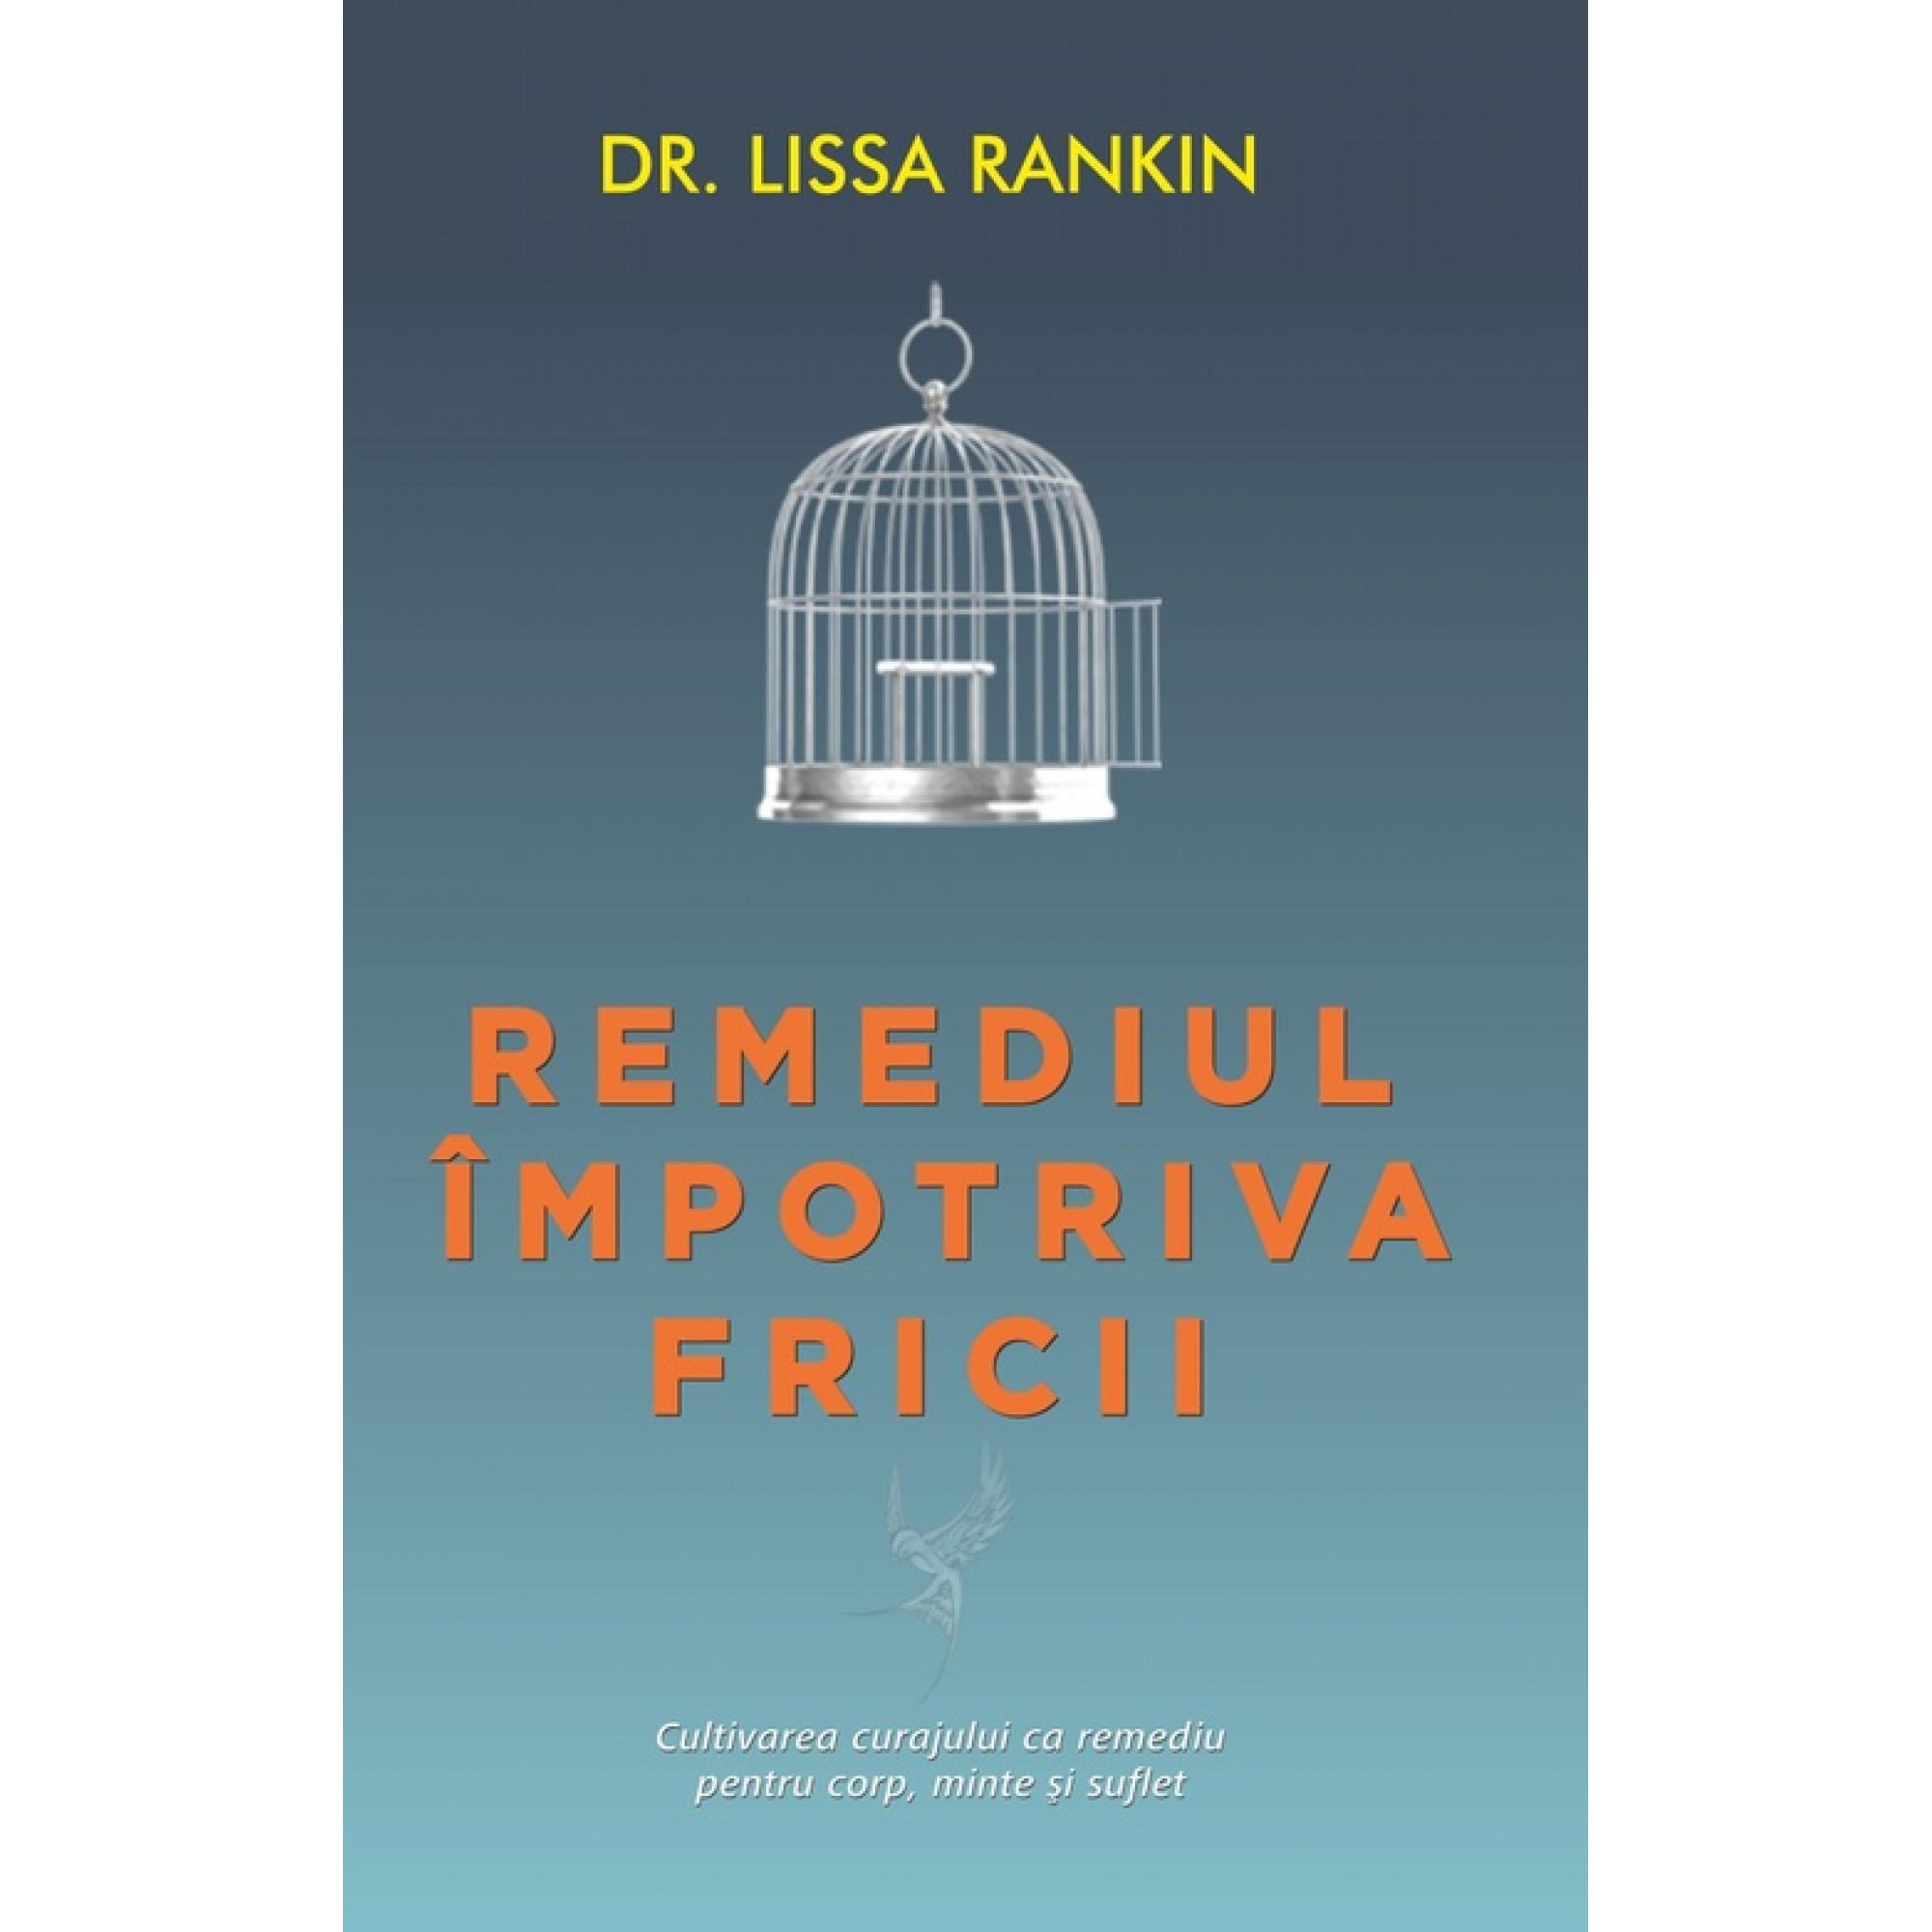 Remediul împotriva fricii; Lissa Rankin